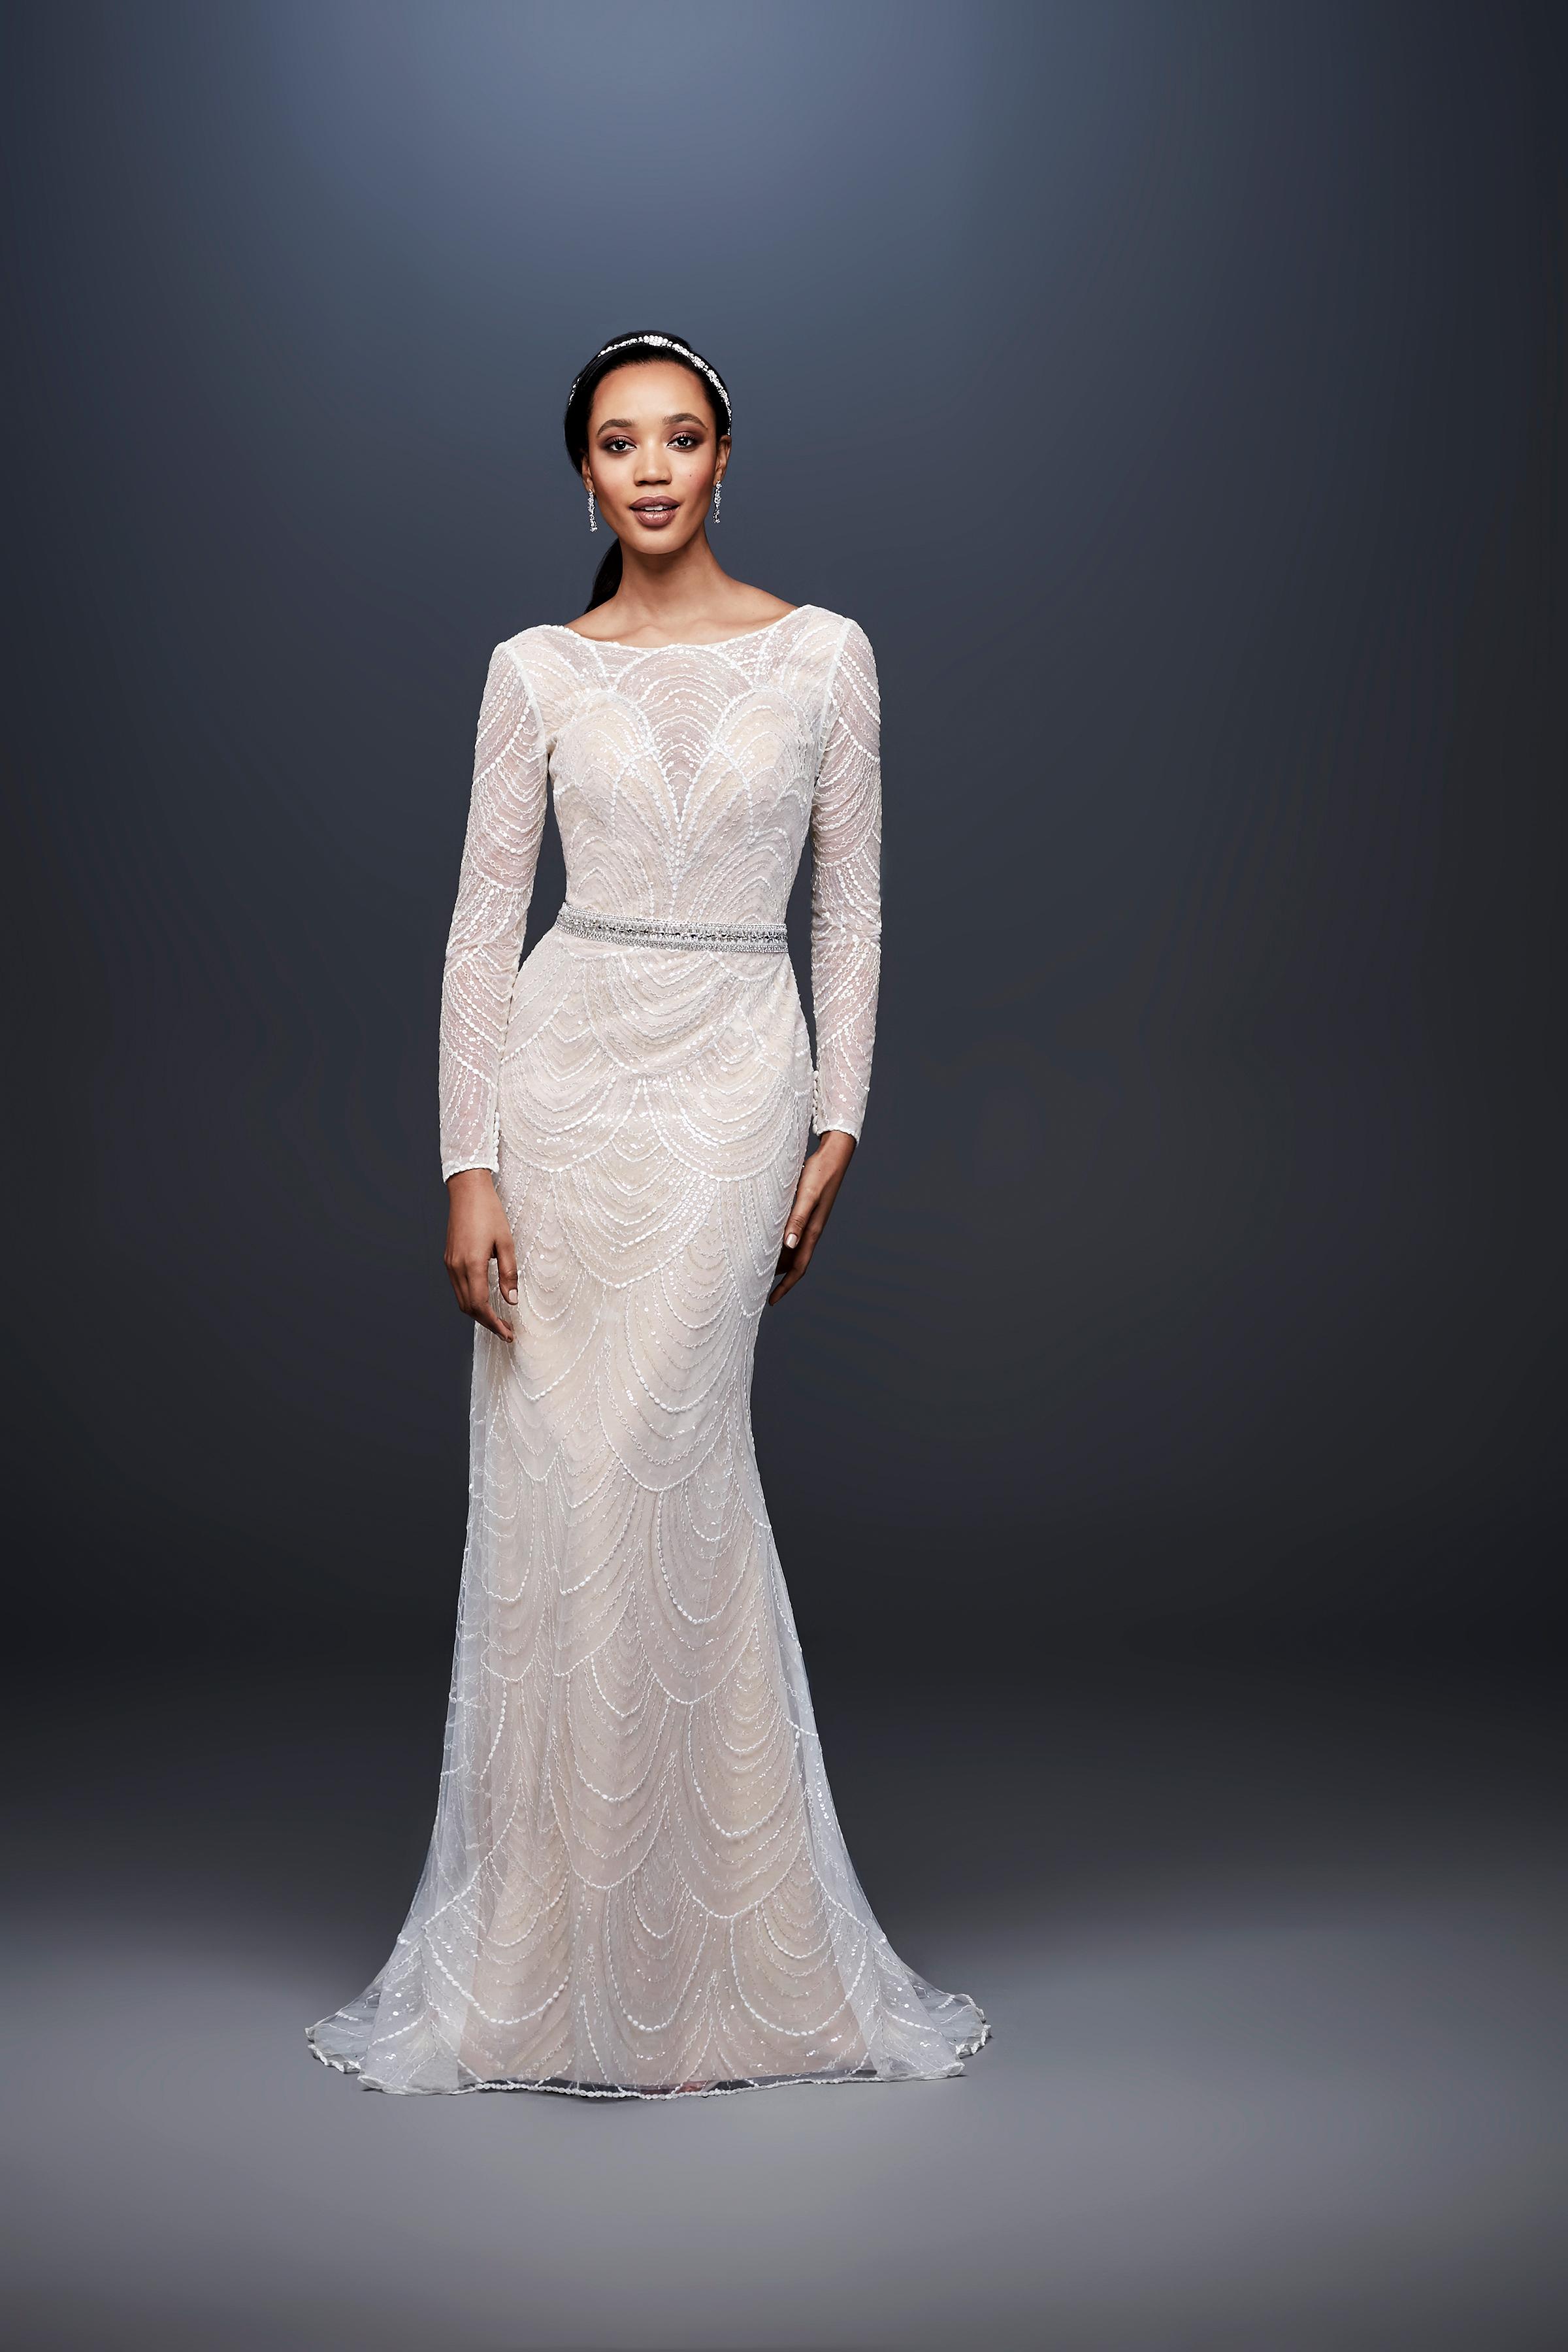 david bridal wedding dress spring 2019 long sleeves beaded high neck